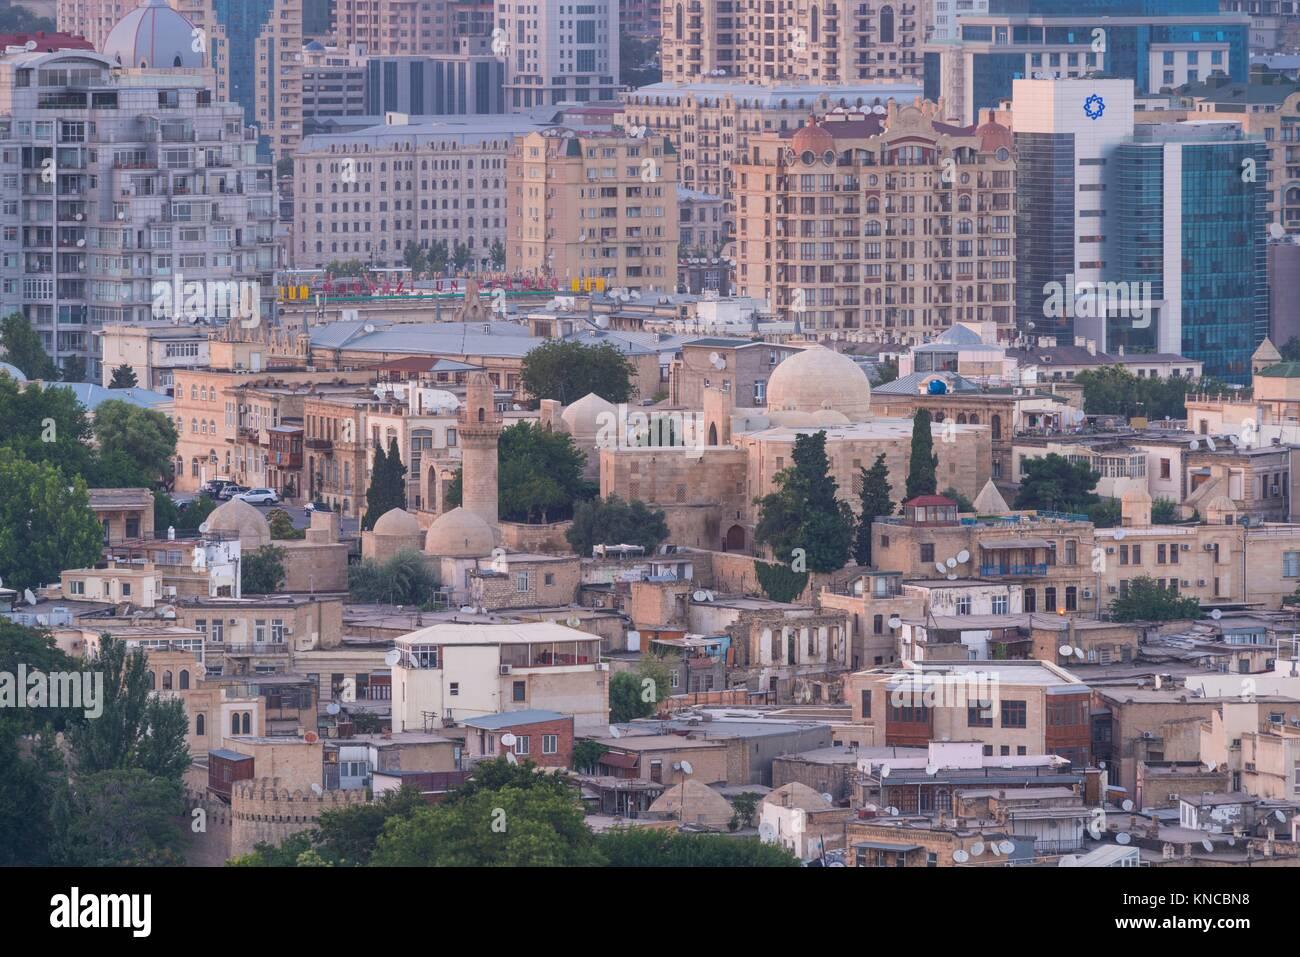 Baku City, Old City, Azerbaijan, Middle East. - Stock Image